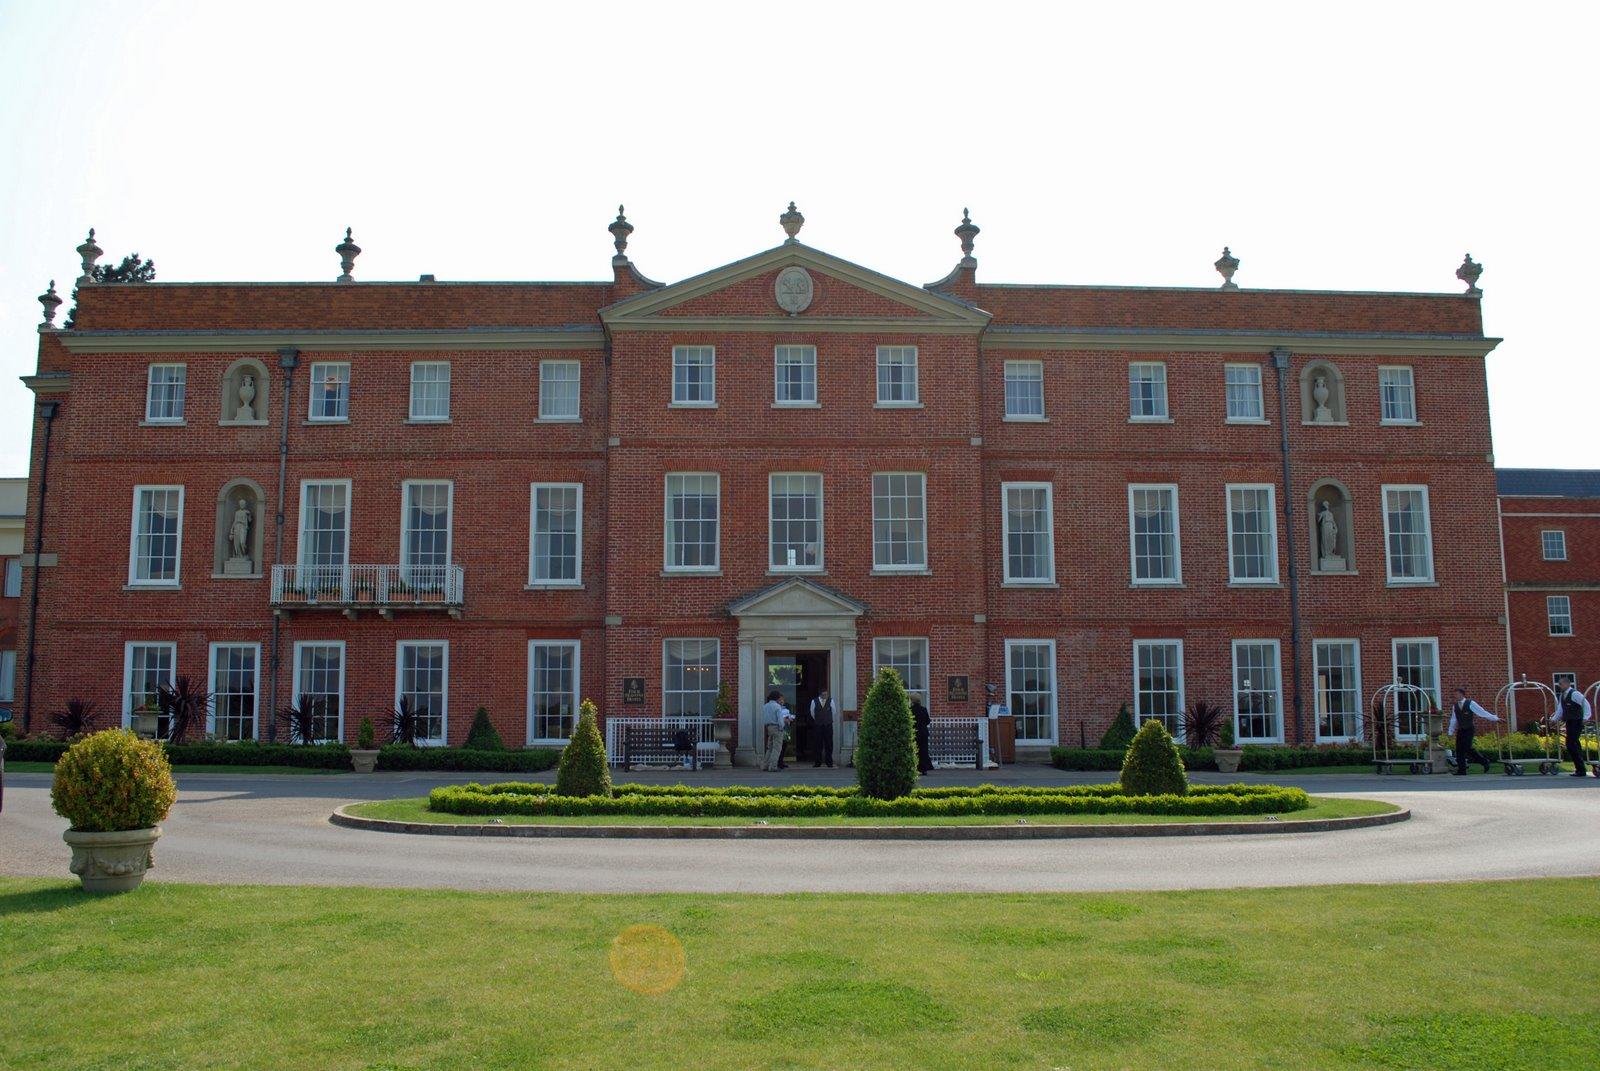 dogmersfield house, four seasons hampshire, england